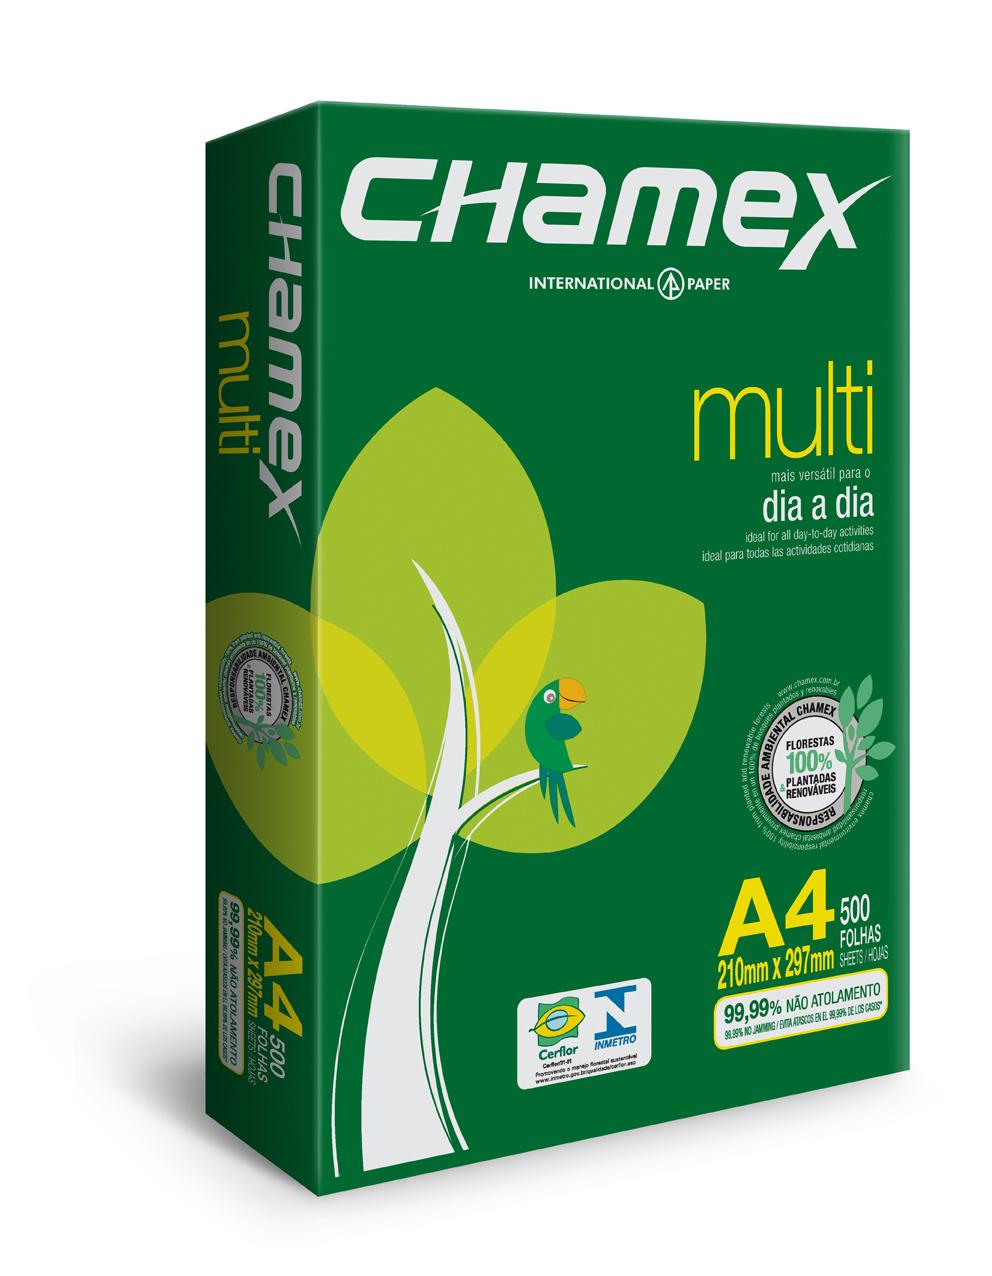 Chamex A4 75gsm BX 10 Reams